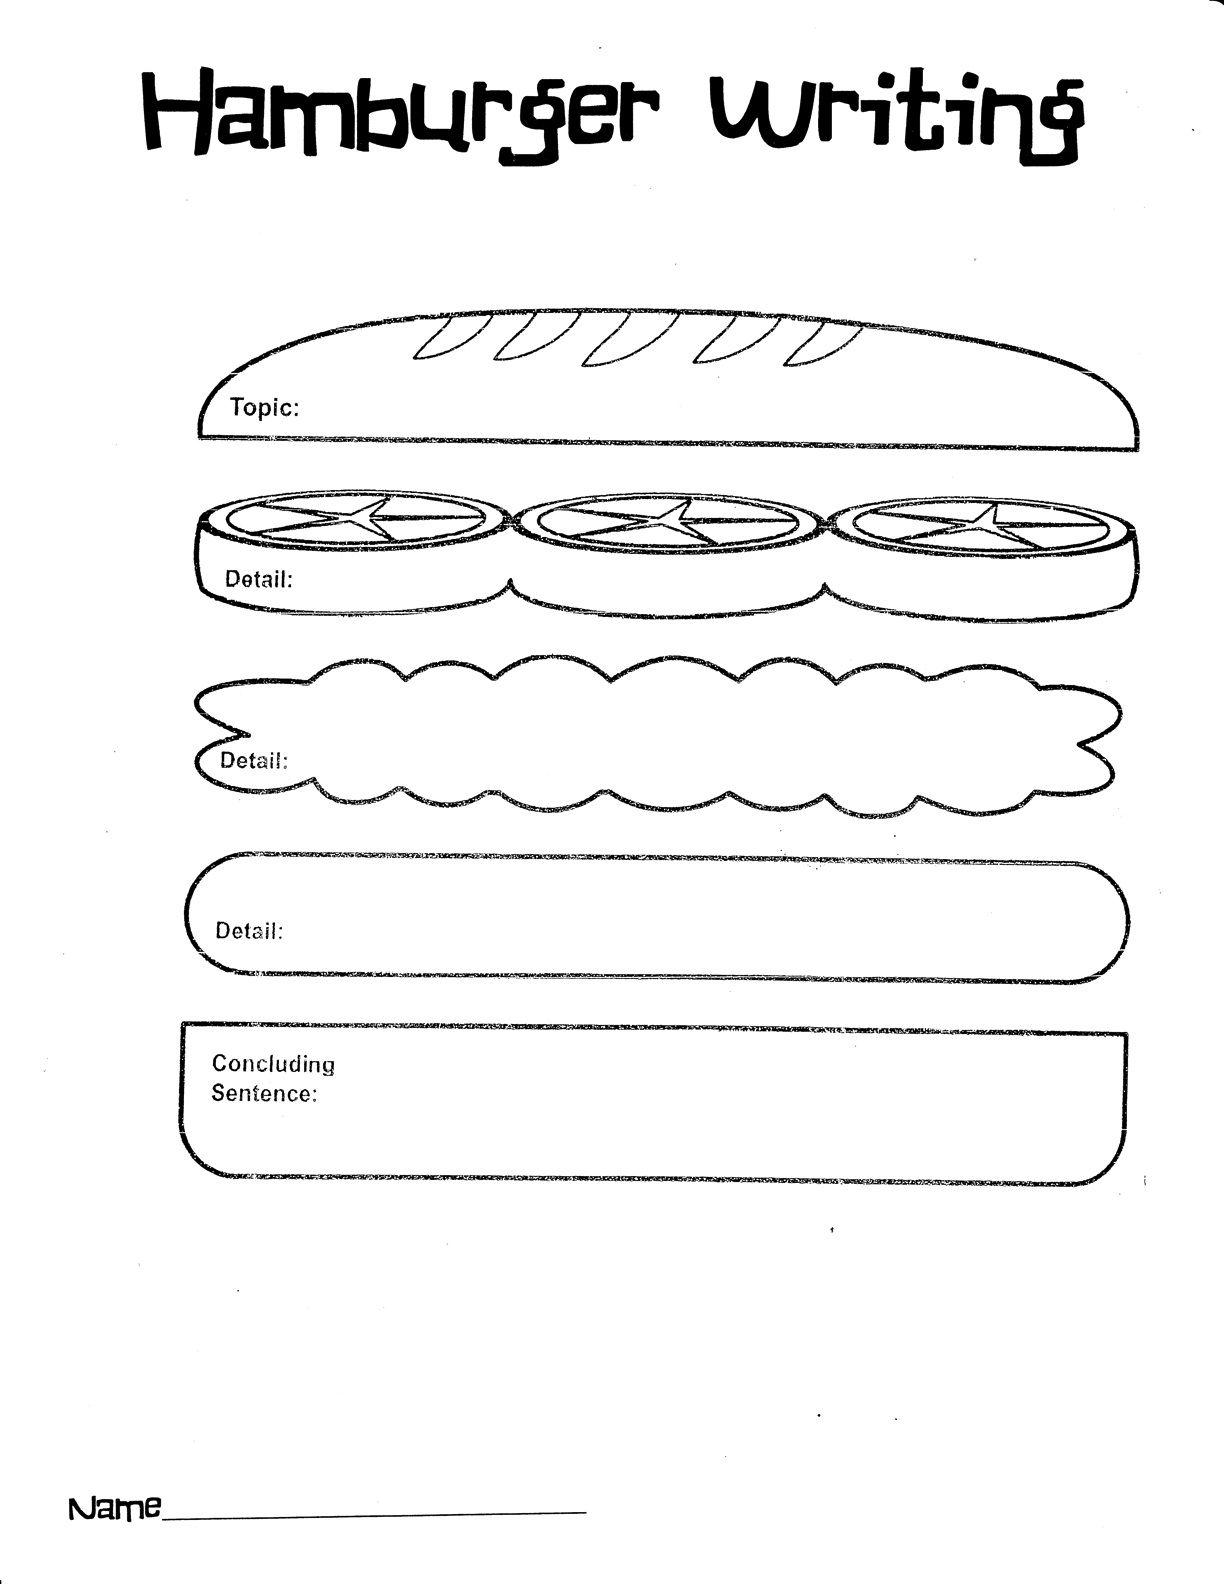 Hamburger Graphic Organizer To Teach Paragraphing